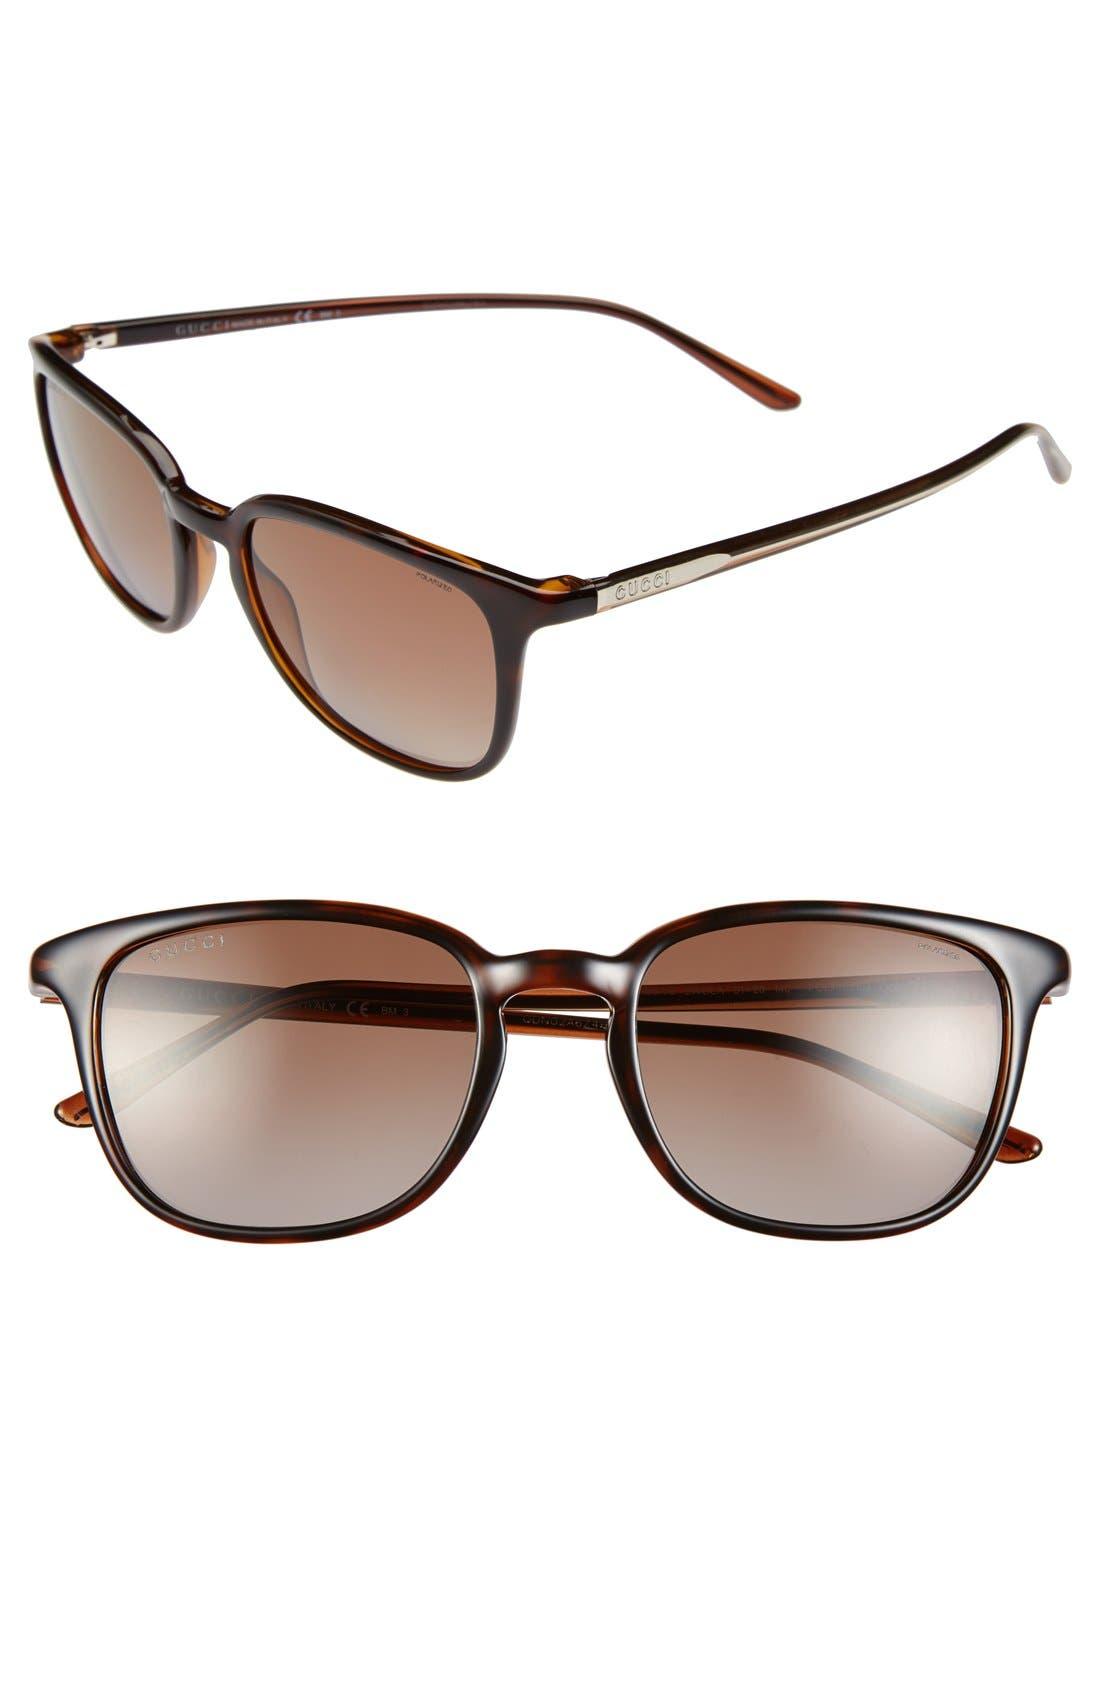 Main Image - Gucci '1067S' 51mm Sunglasses